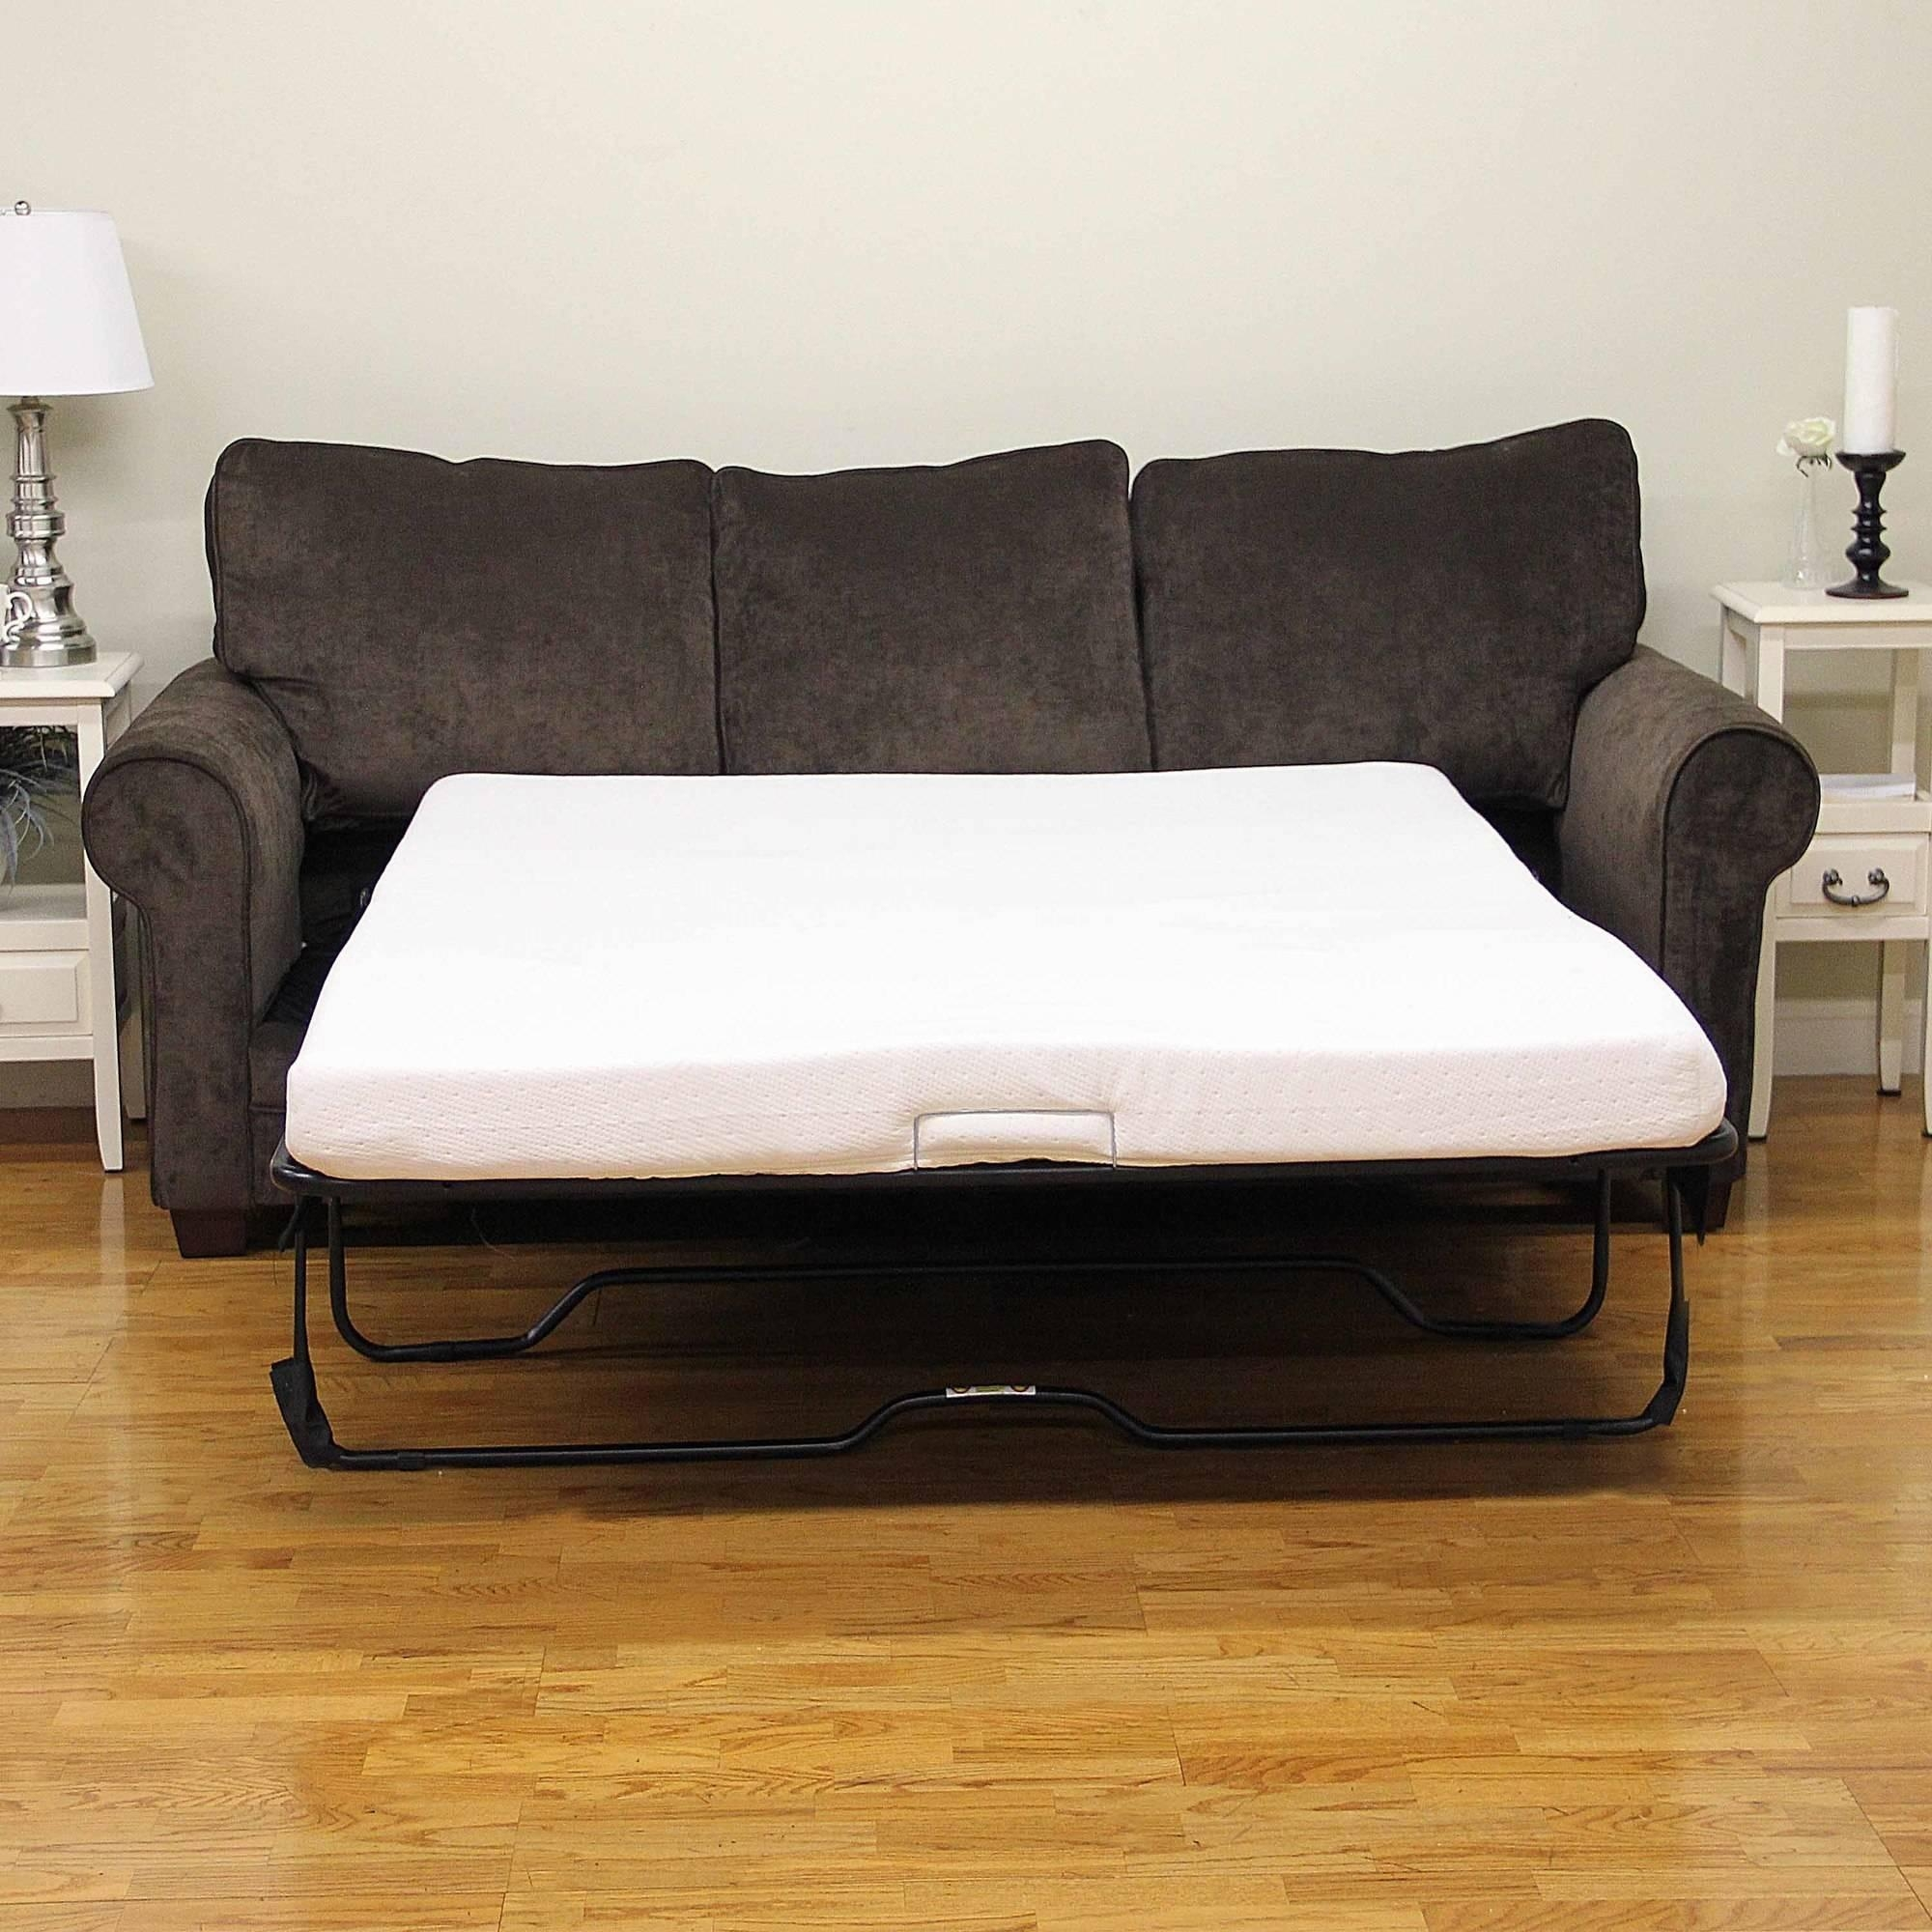 Modern Sleep Memory Foam  (Image 14 of 20)